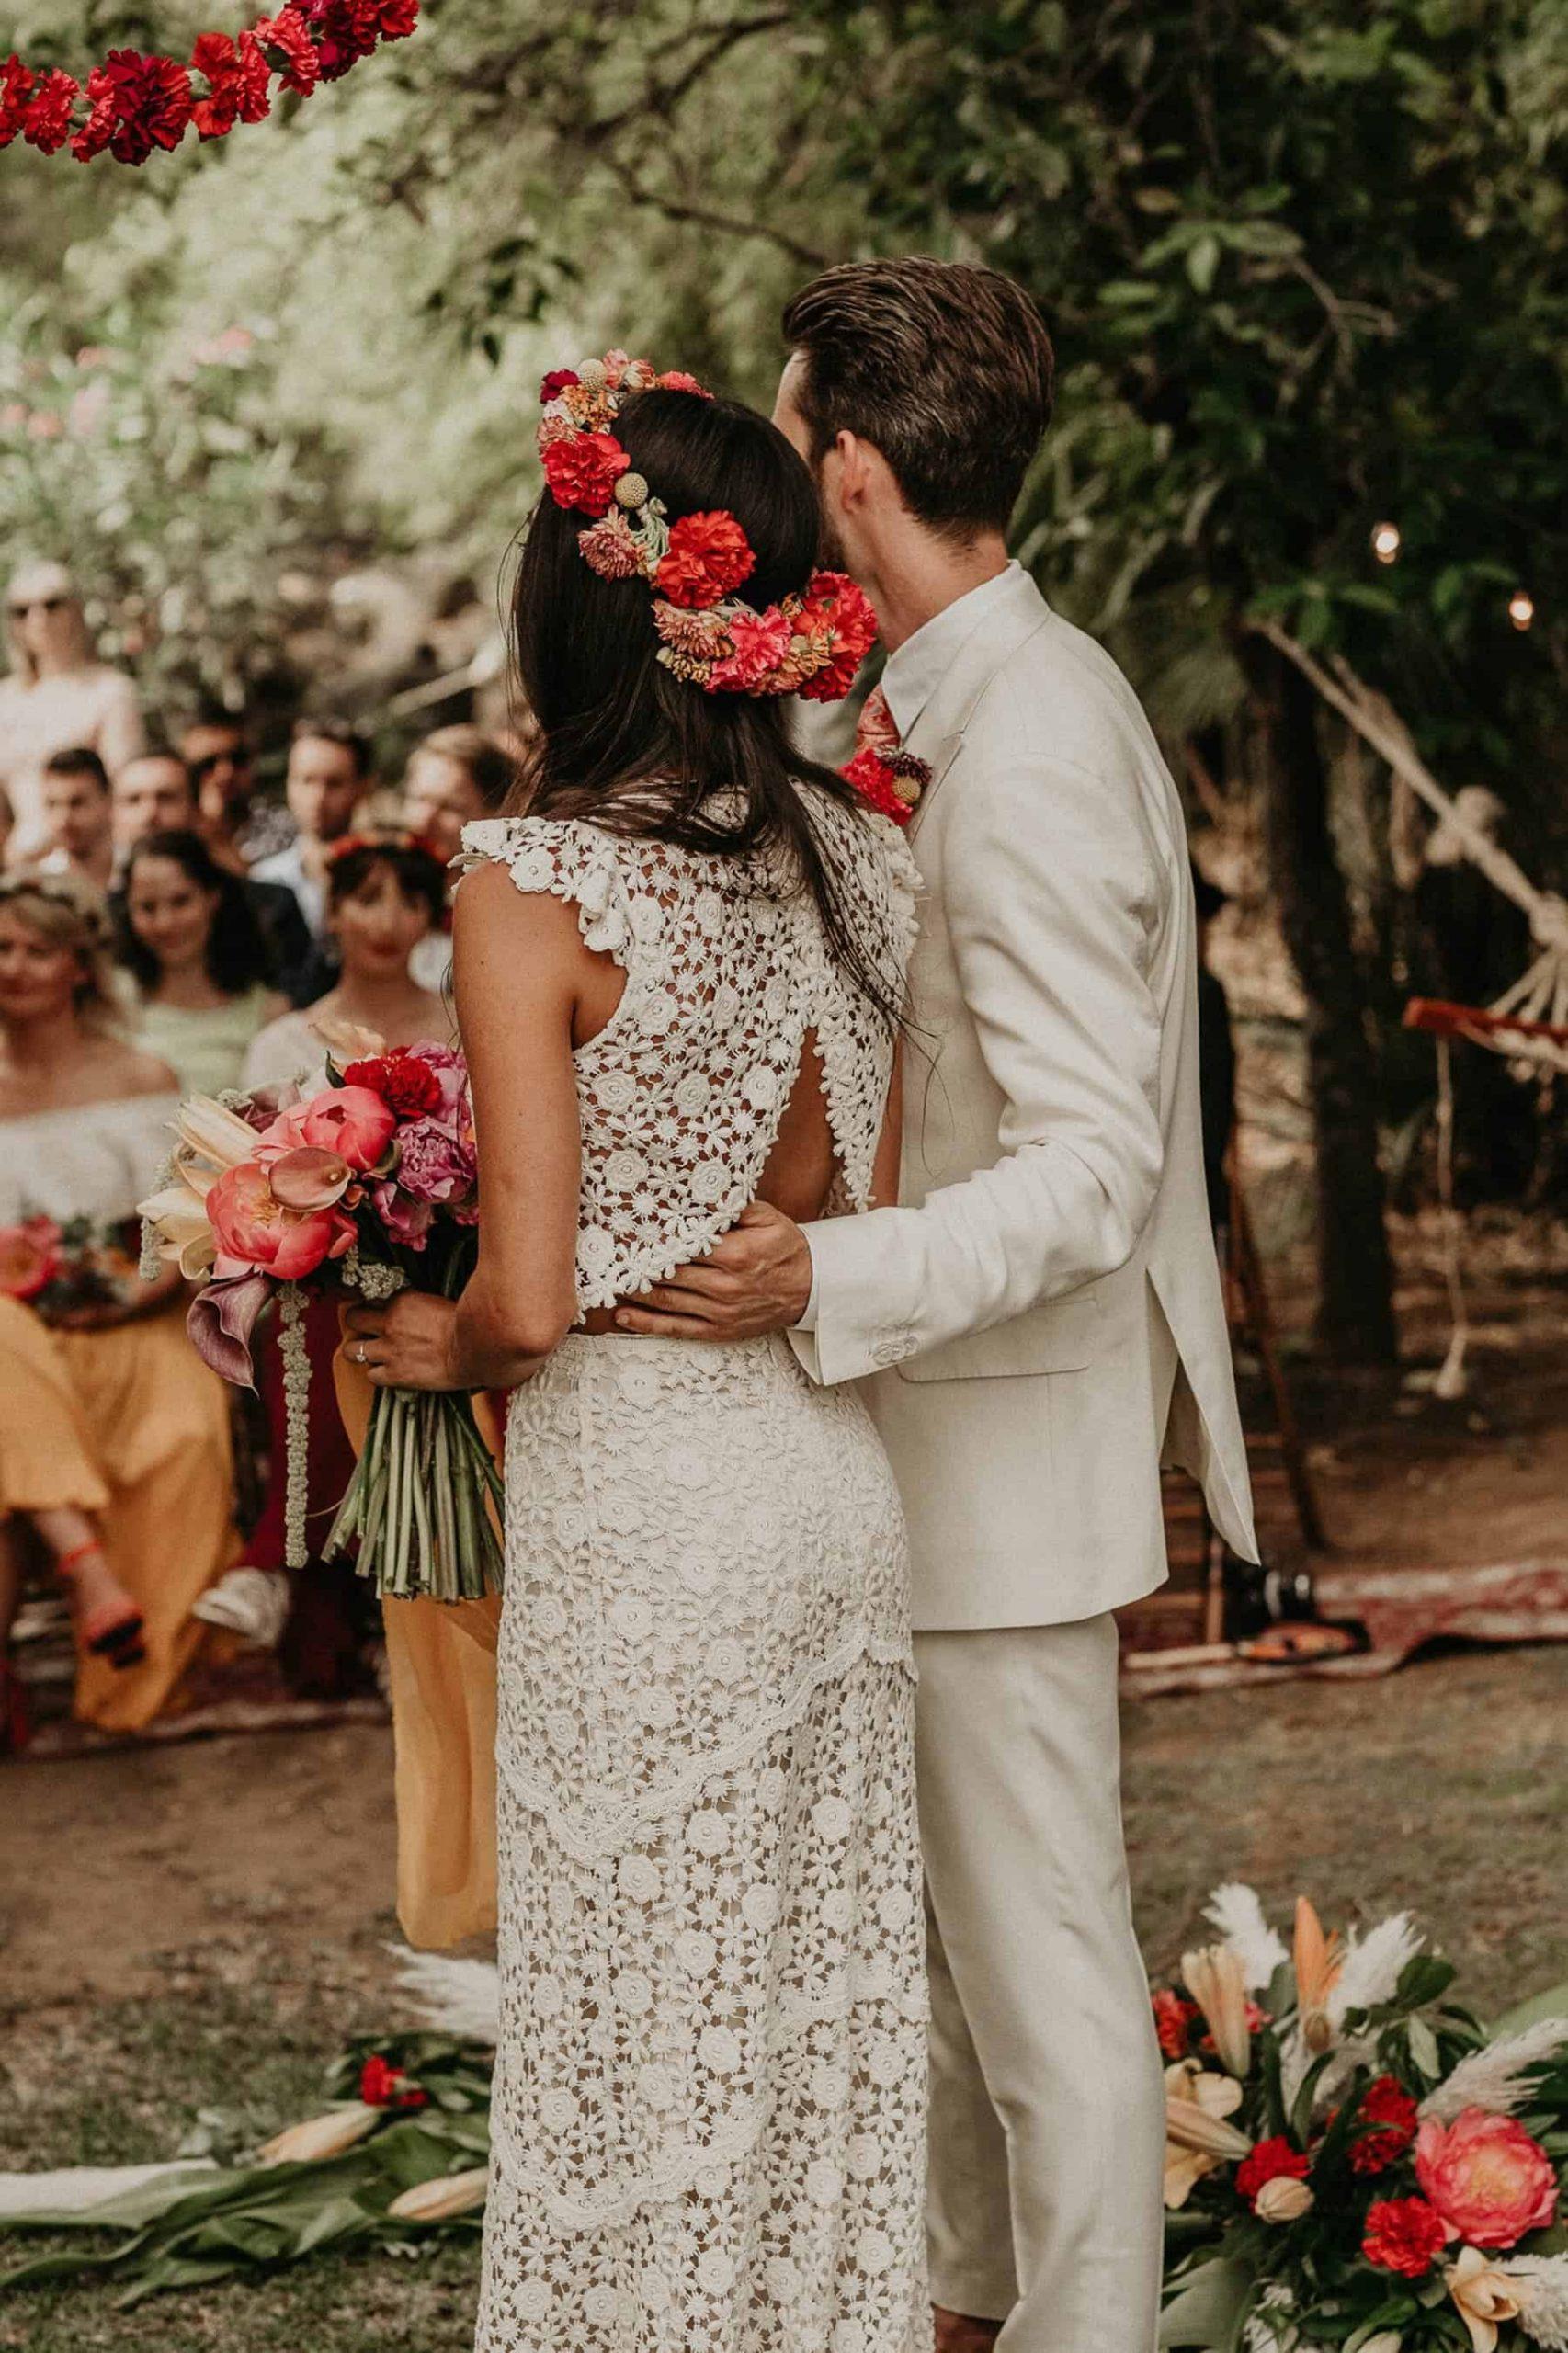 Bruid met een trouwjurk met losse rok en top